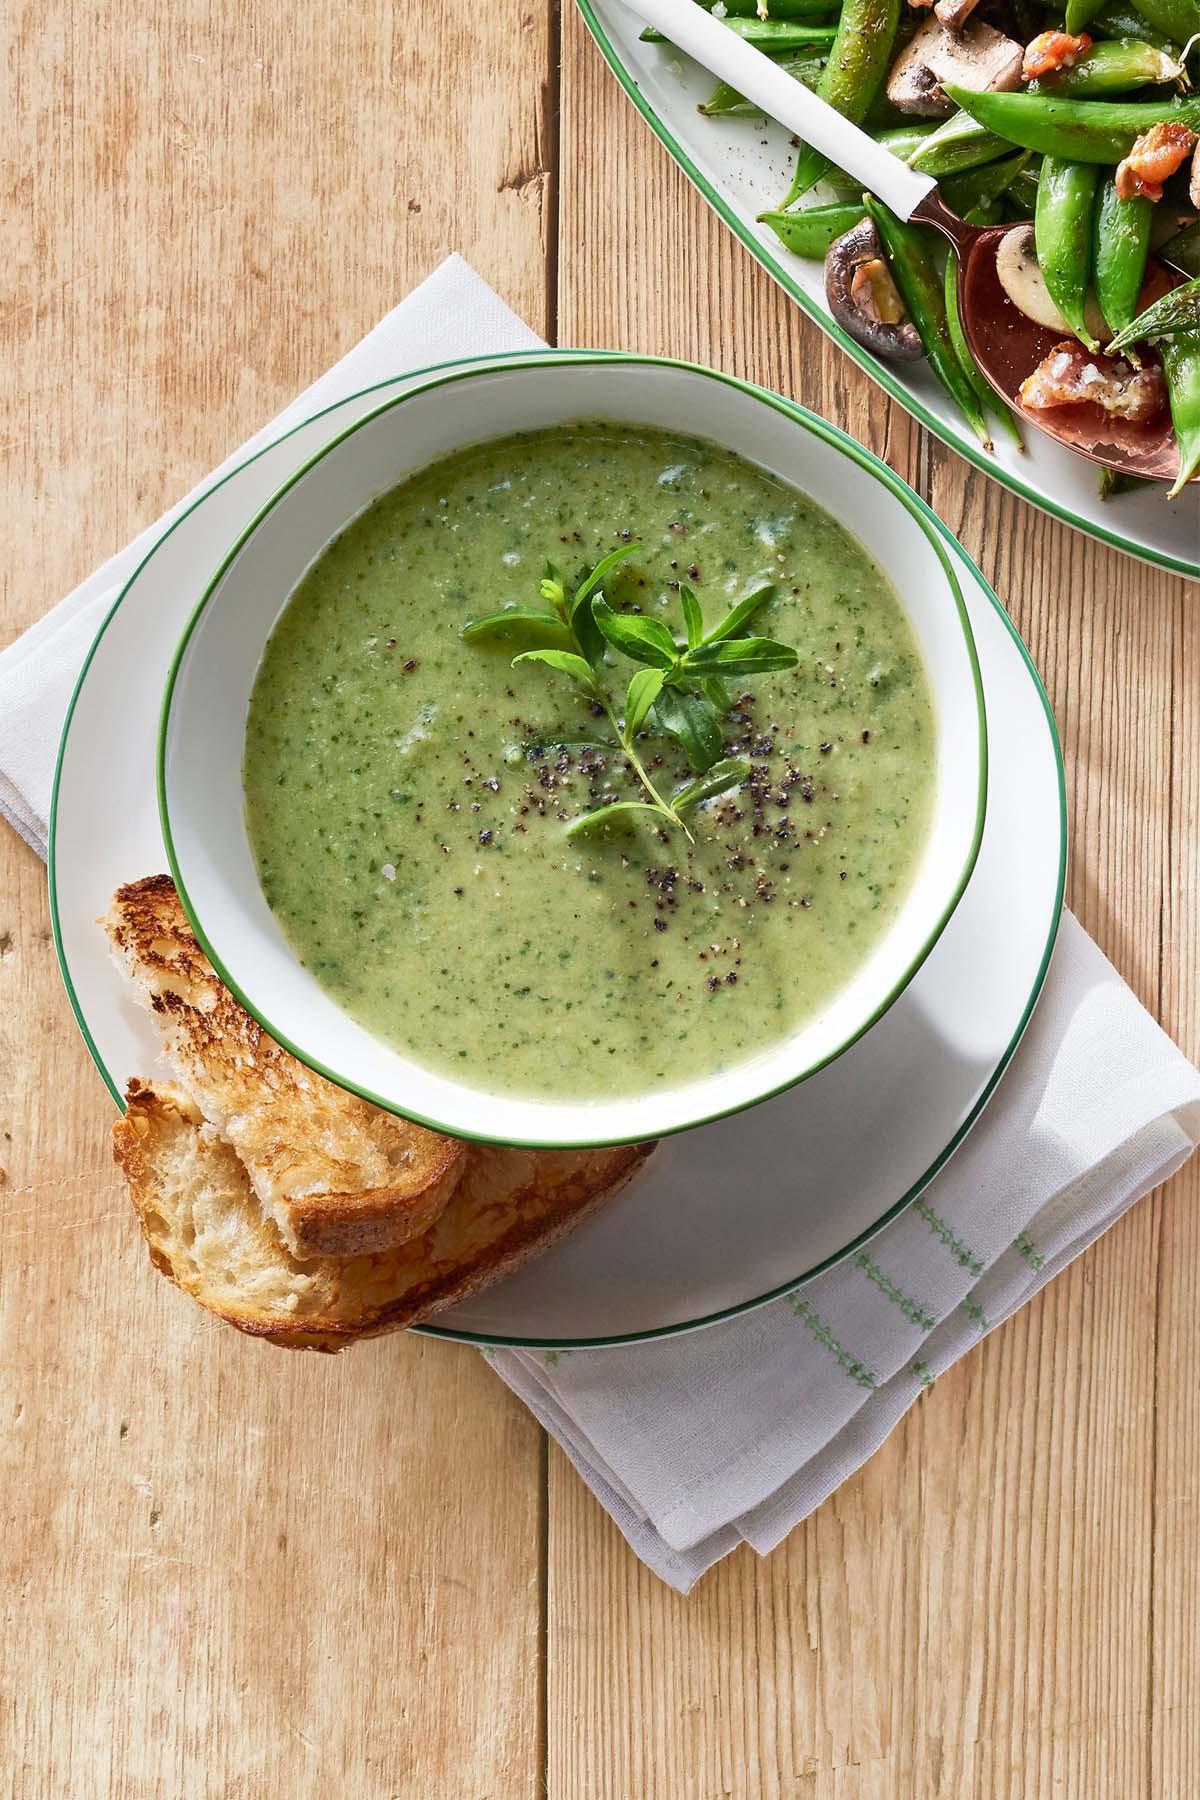 Easy Healthy Soups  48 Best Healthy Soup Recipes Quick & Easy Low Calorie Soups